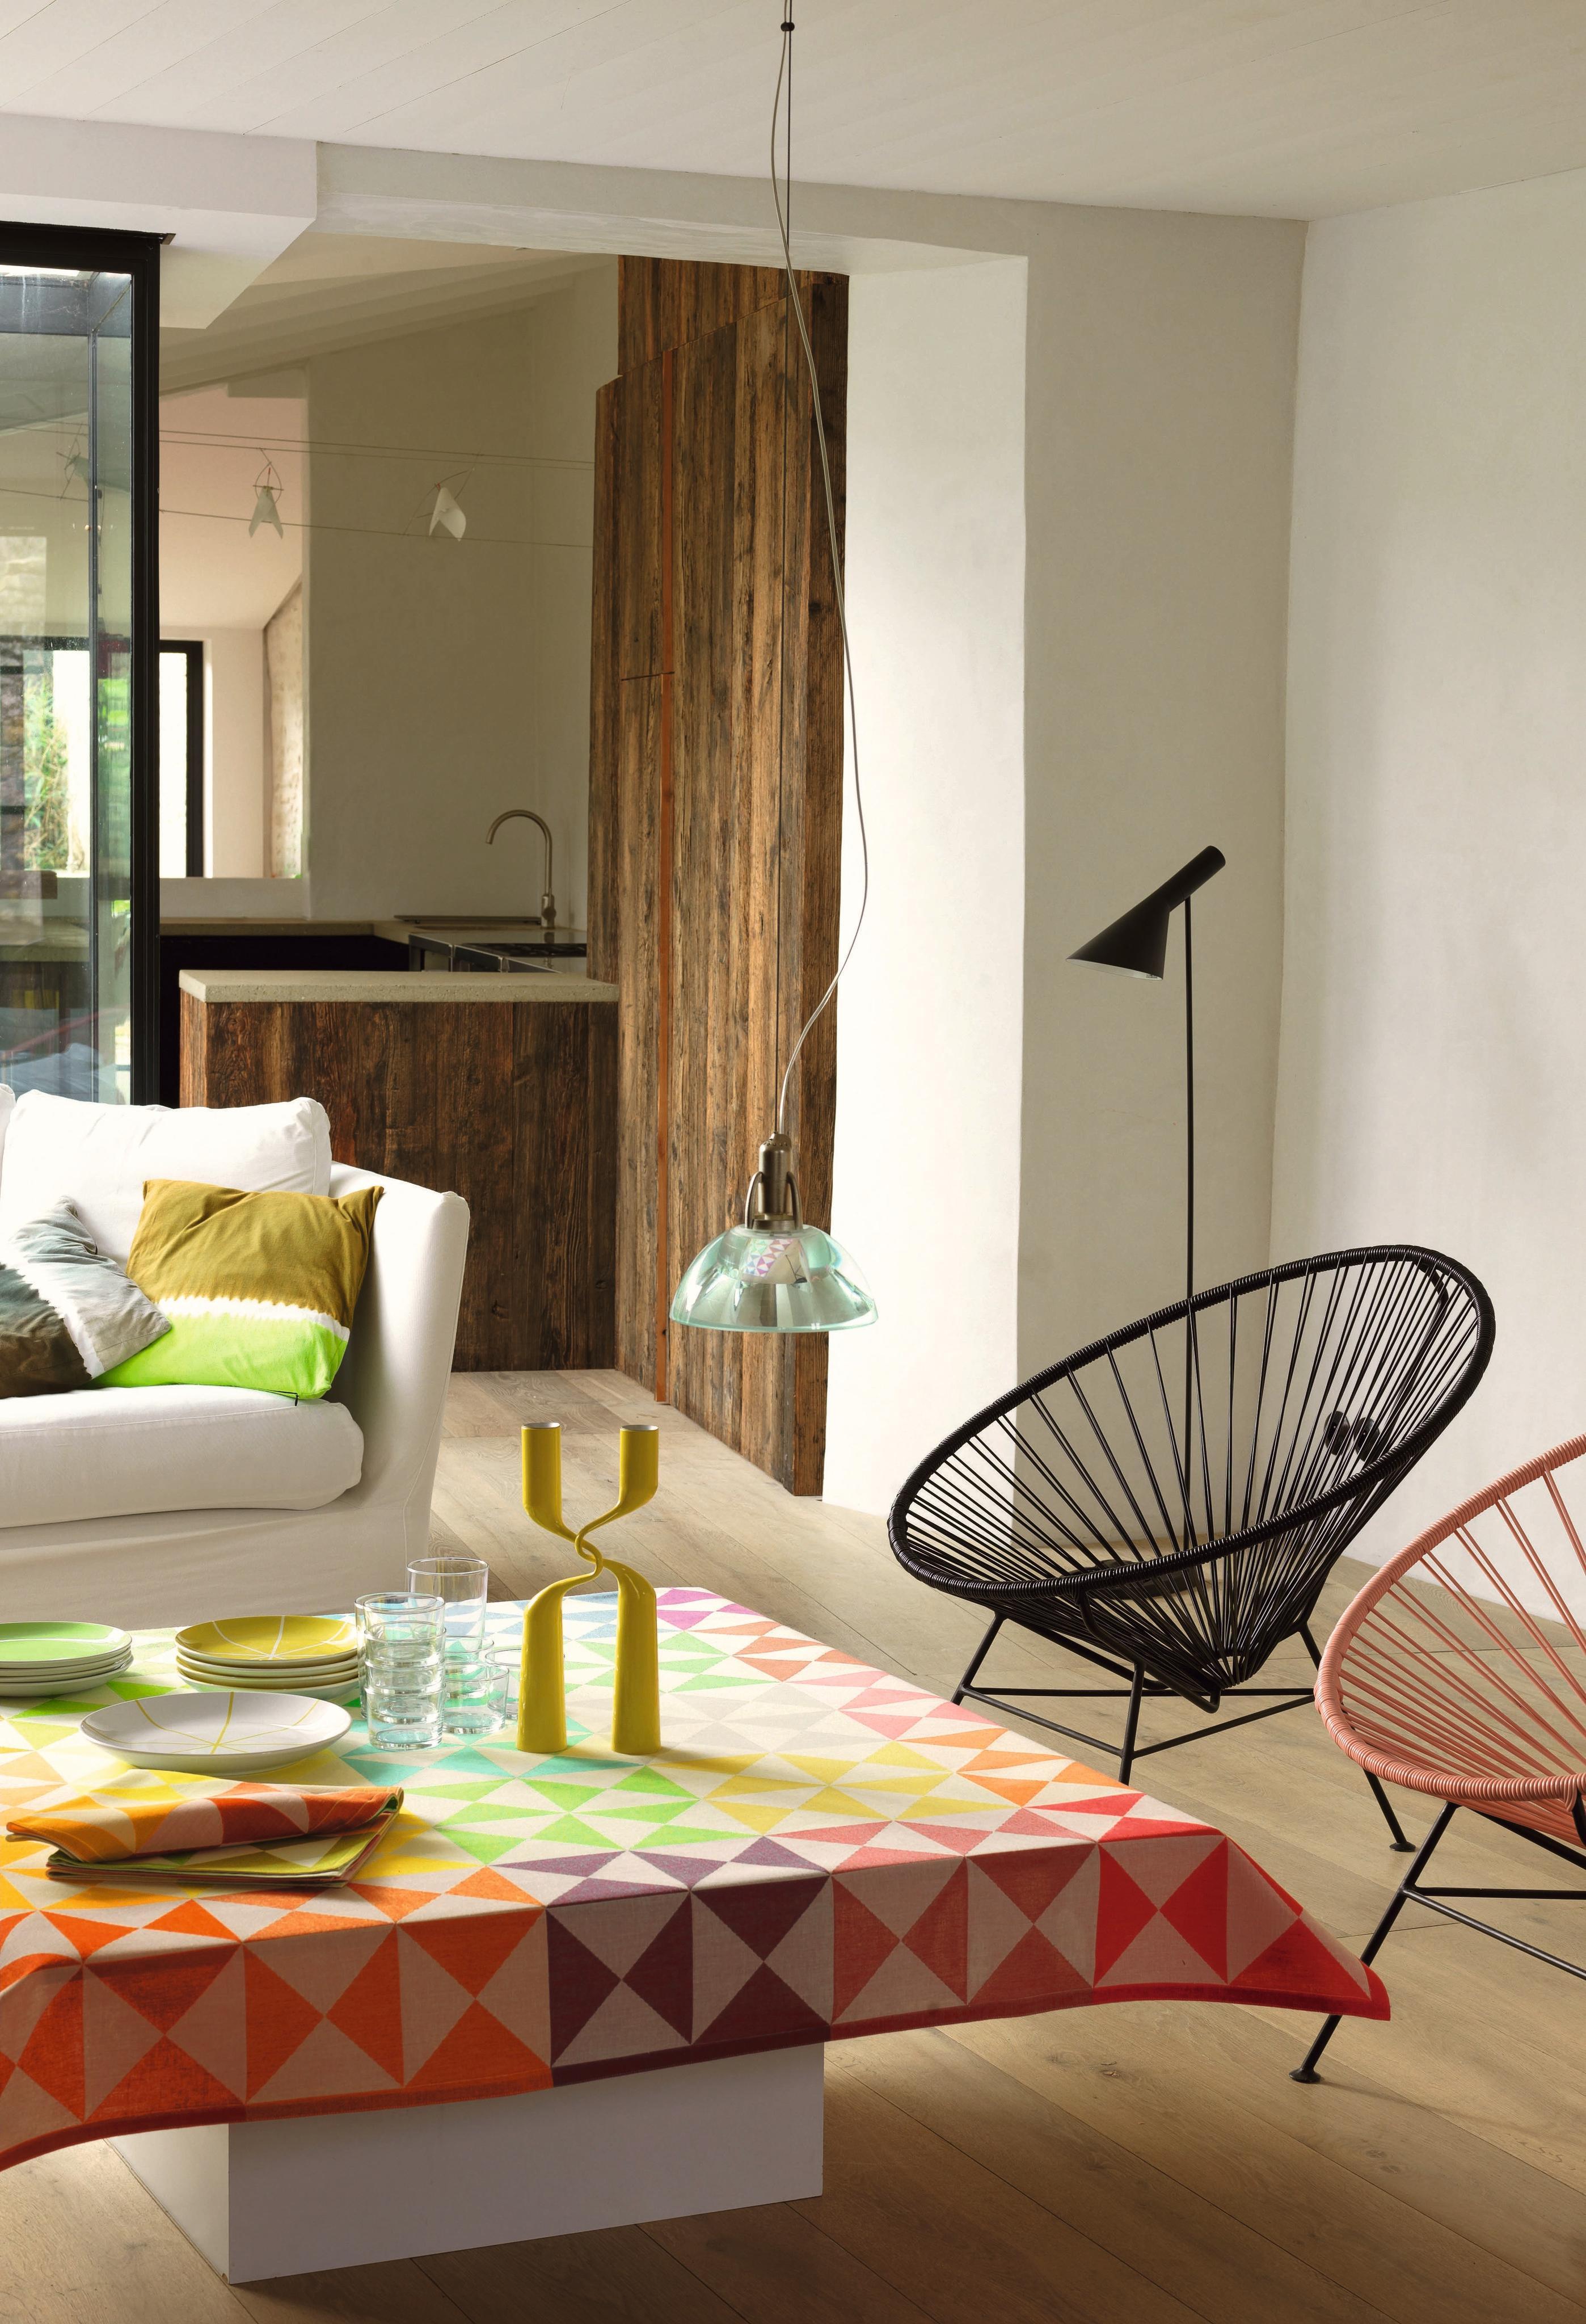 sofakissen • bilder & ideen • couchstyle, Hause deko